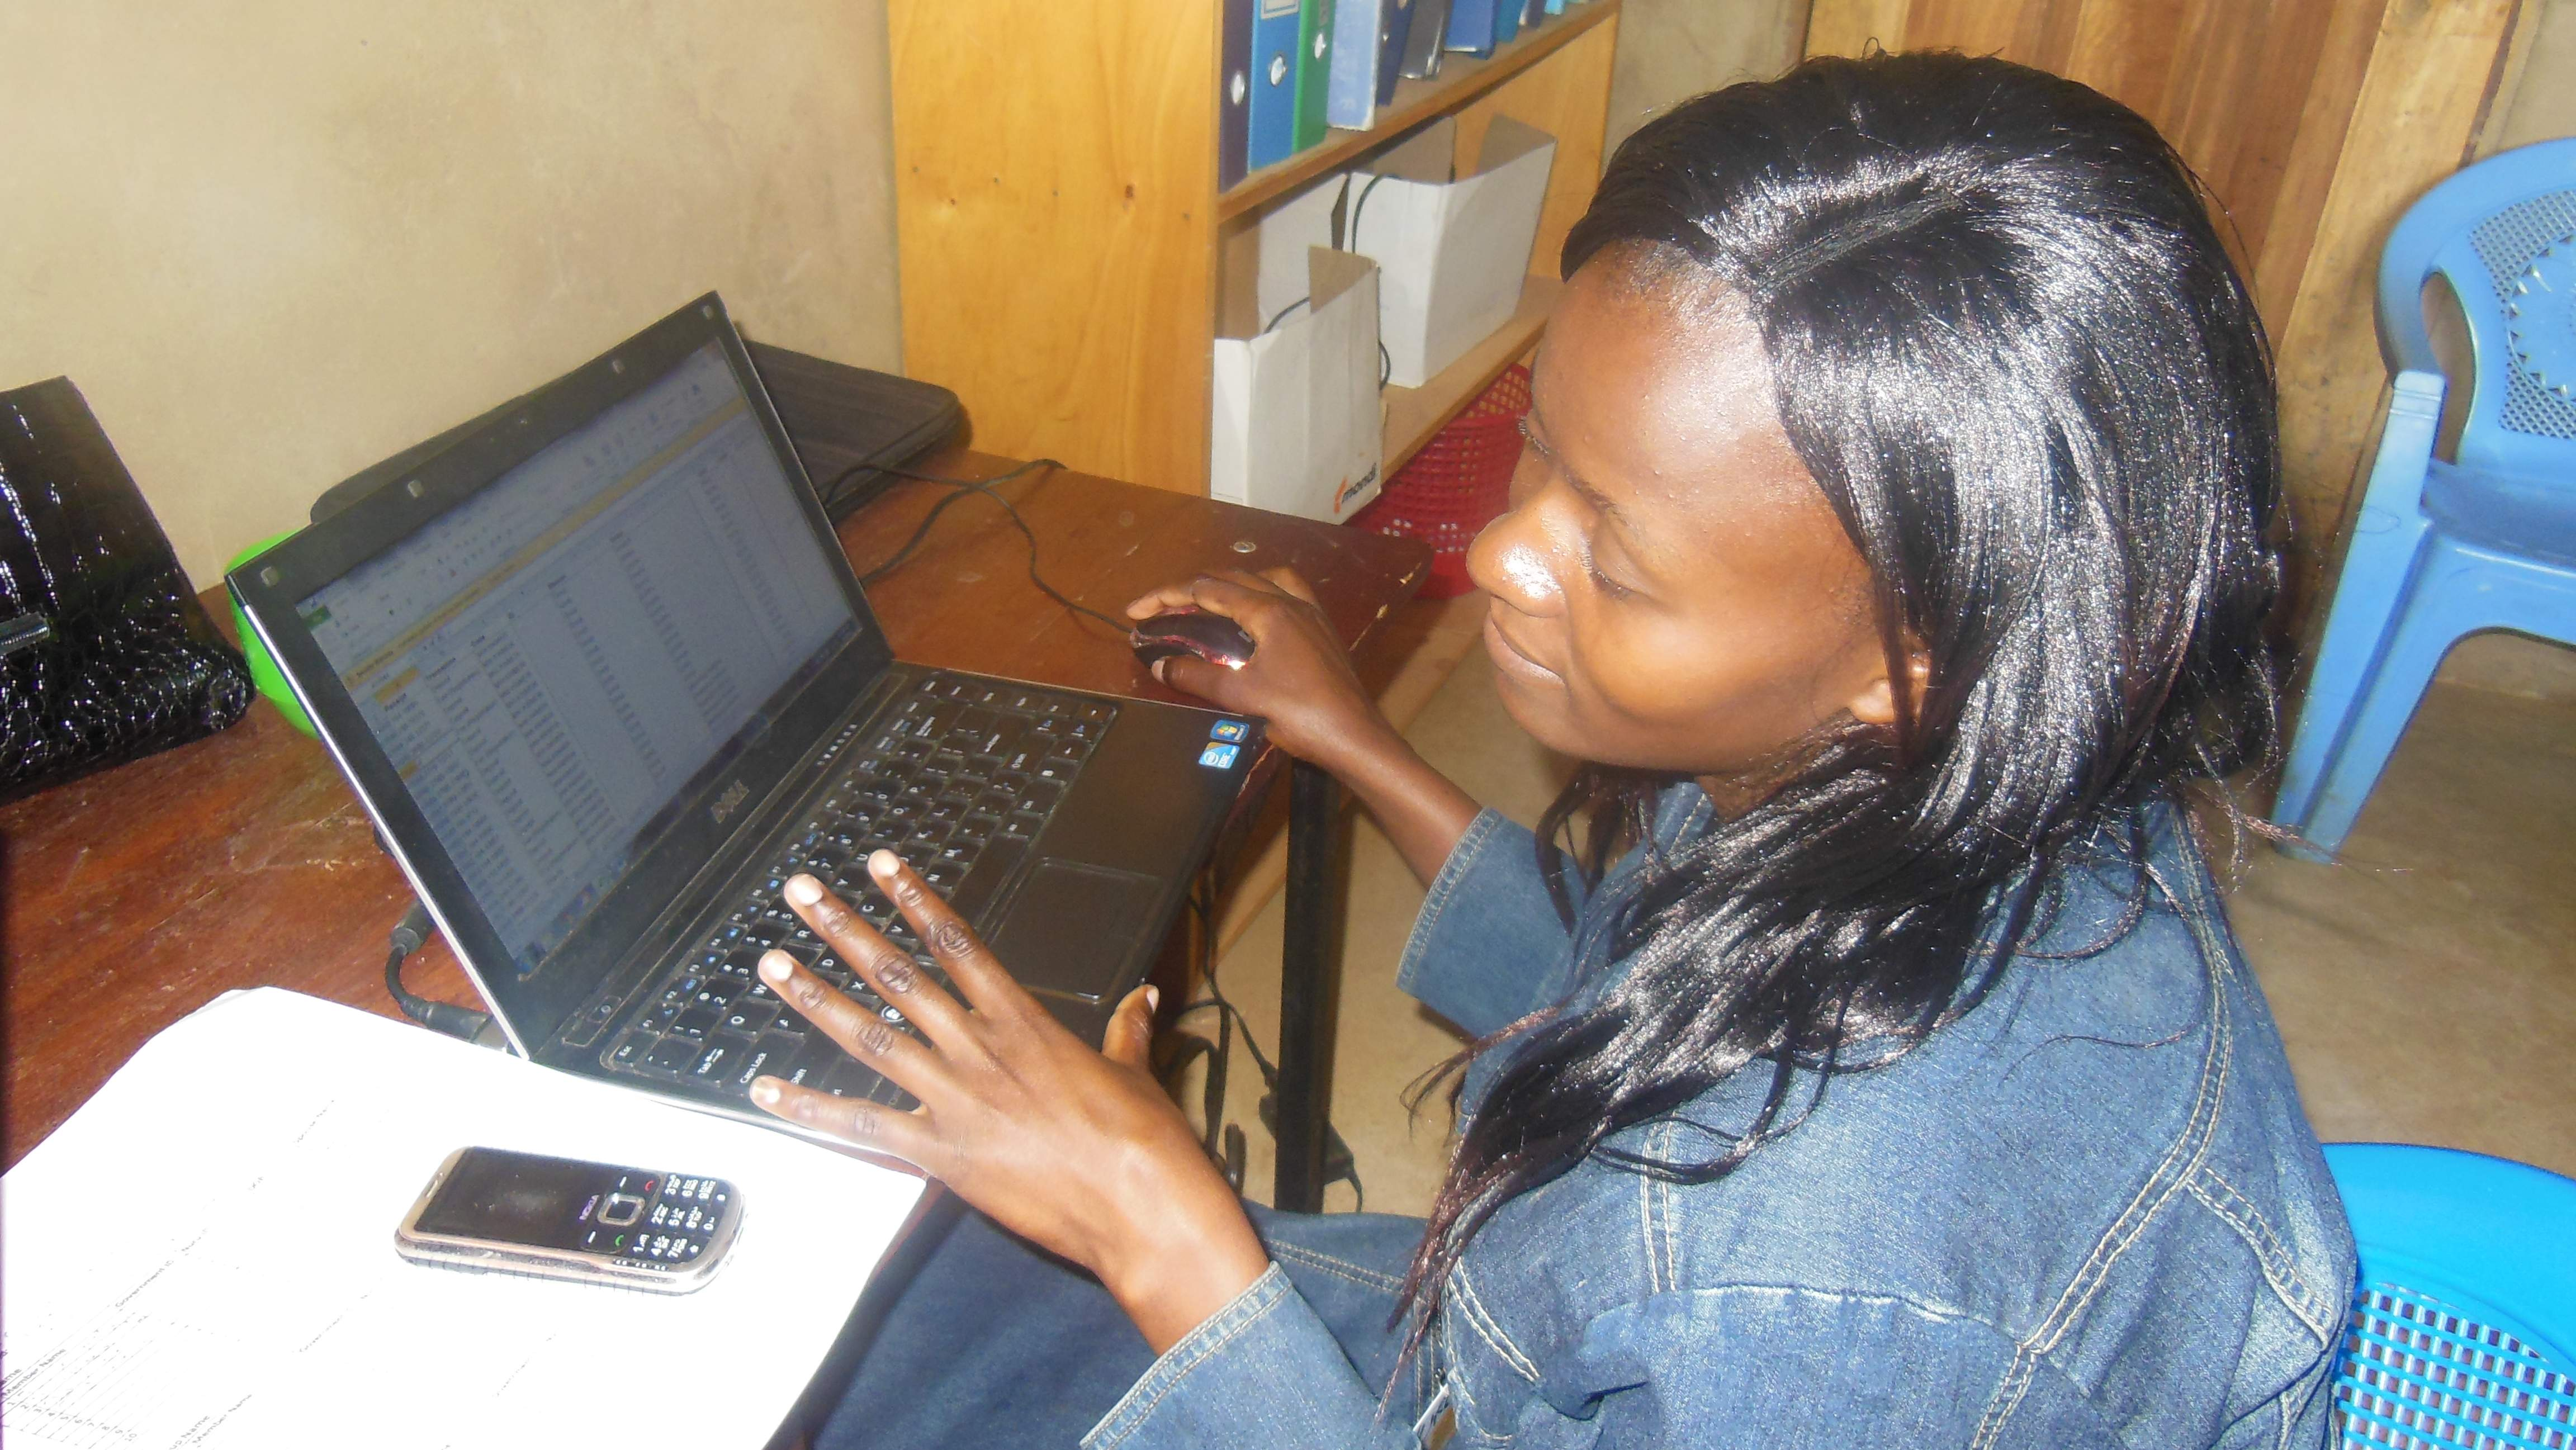 Christine Alvitsa, Nuru Kenya Financial Inclusion Program Information Systems Specialist, enters data into Mifos at the Nuru Kenya office.